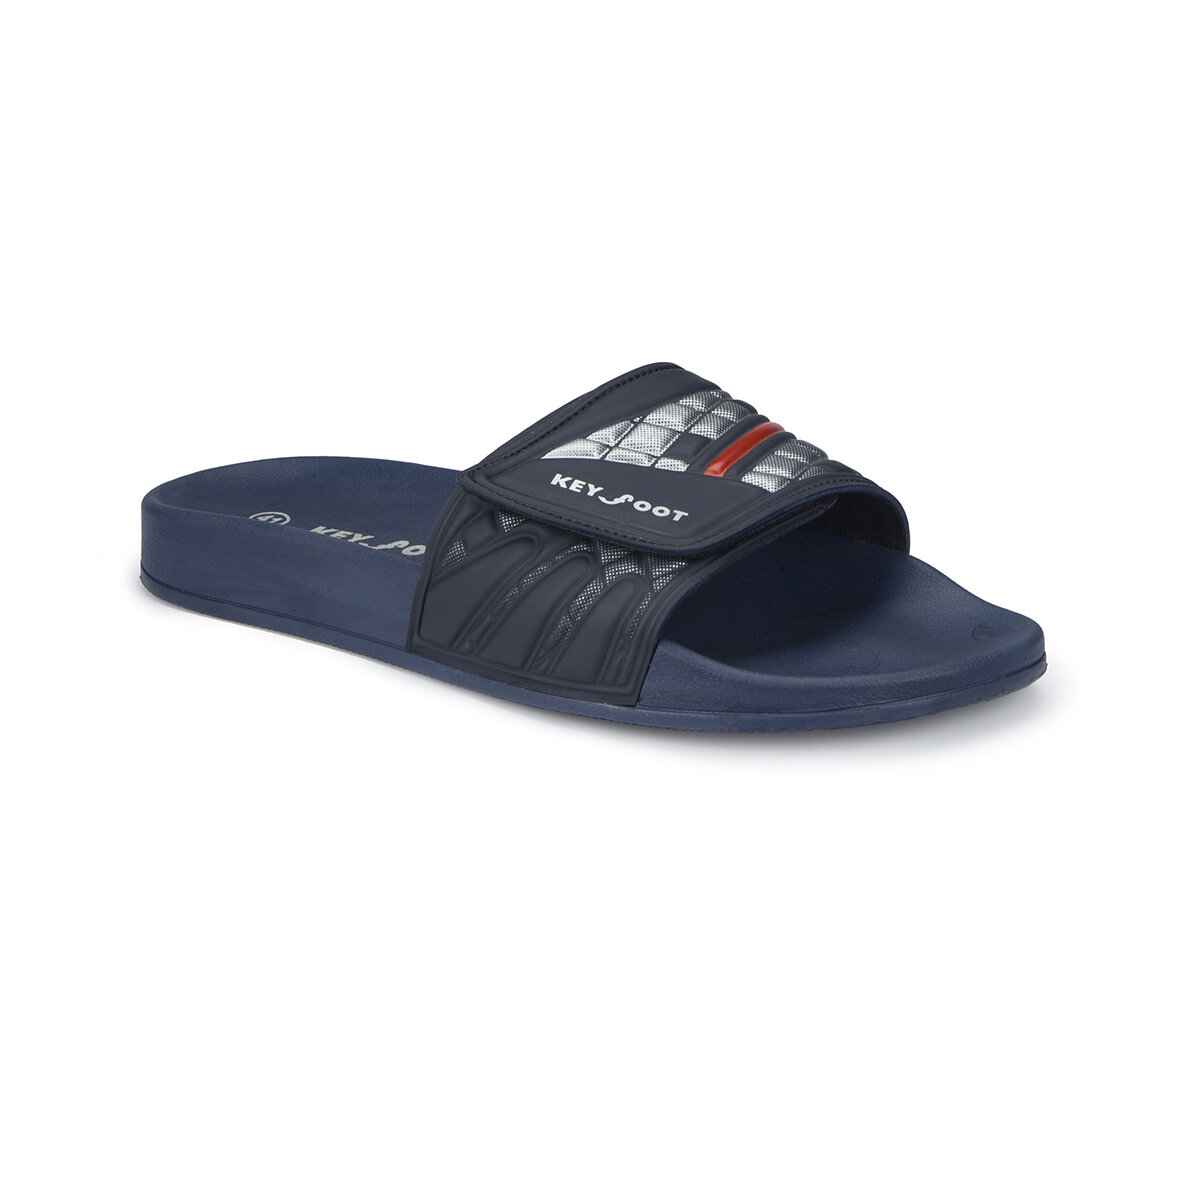 FLO 81.452199.M Navy Blue Male Slippers Polaris